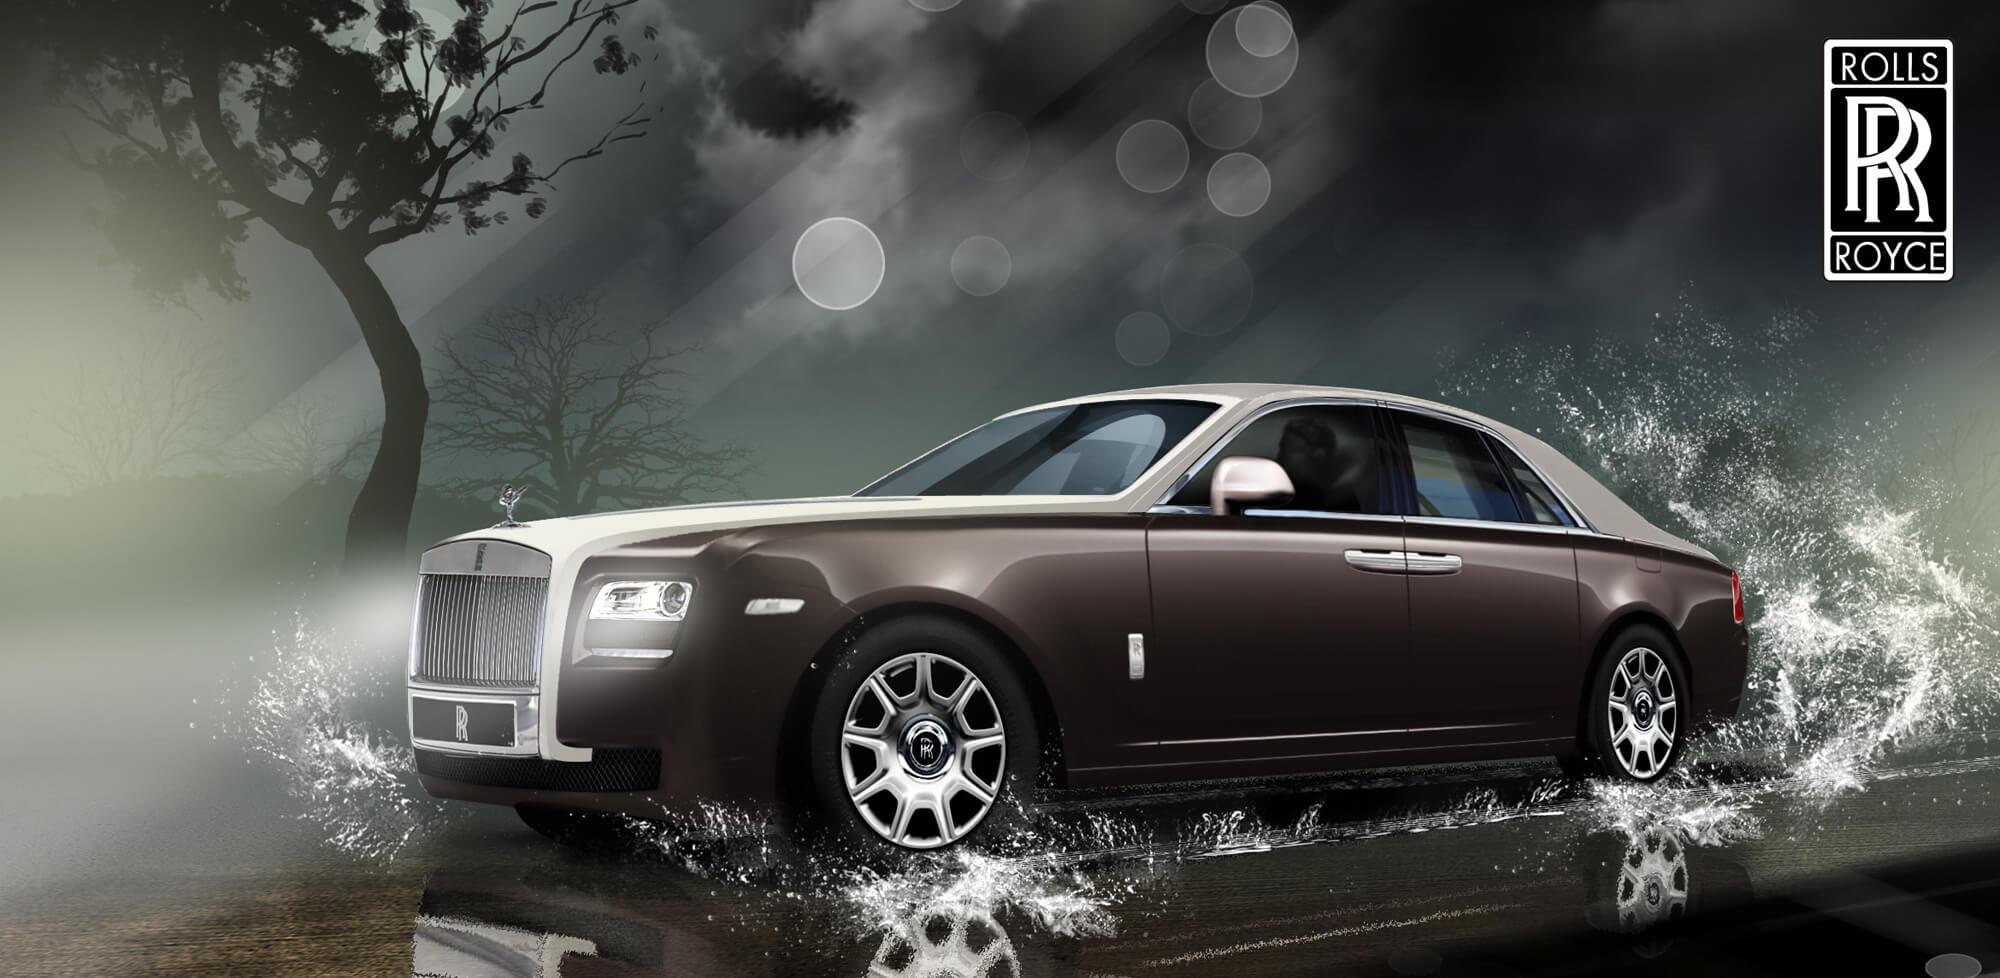 Rolls_Royce_Print_Ads_2.jpg